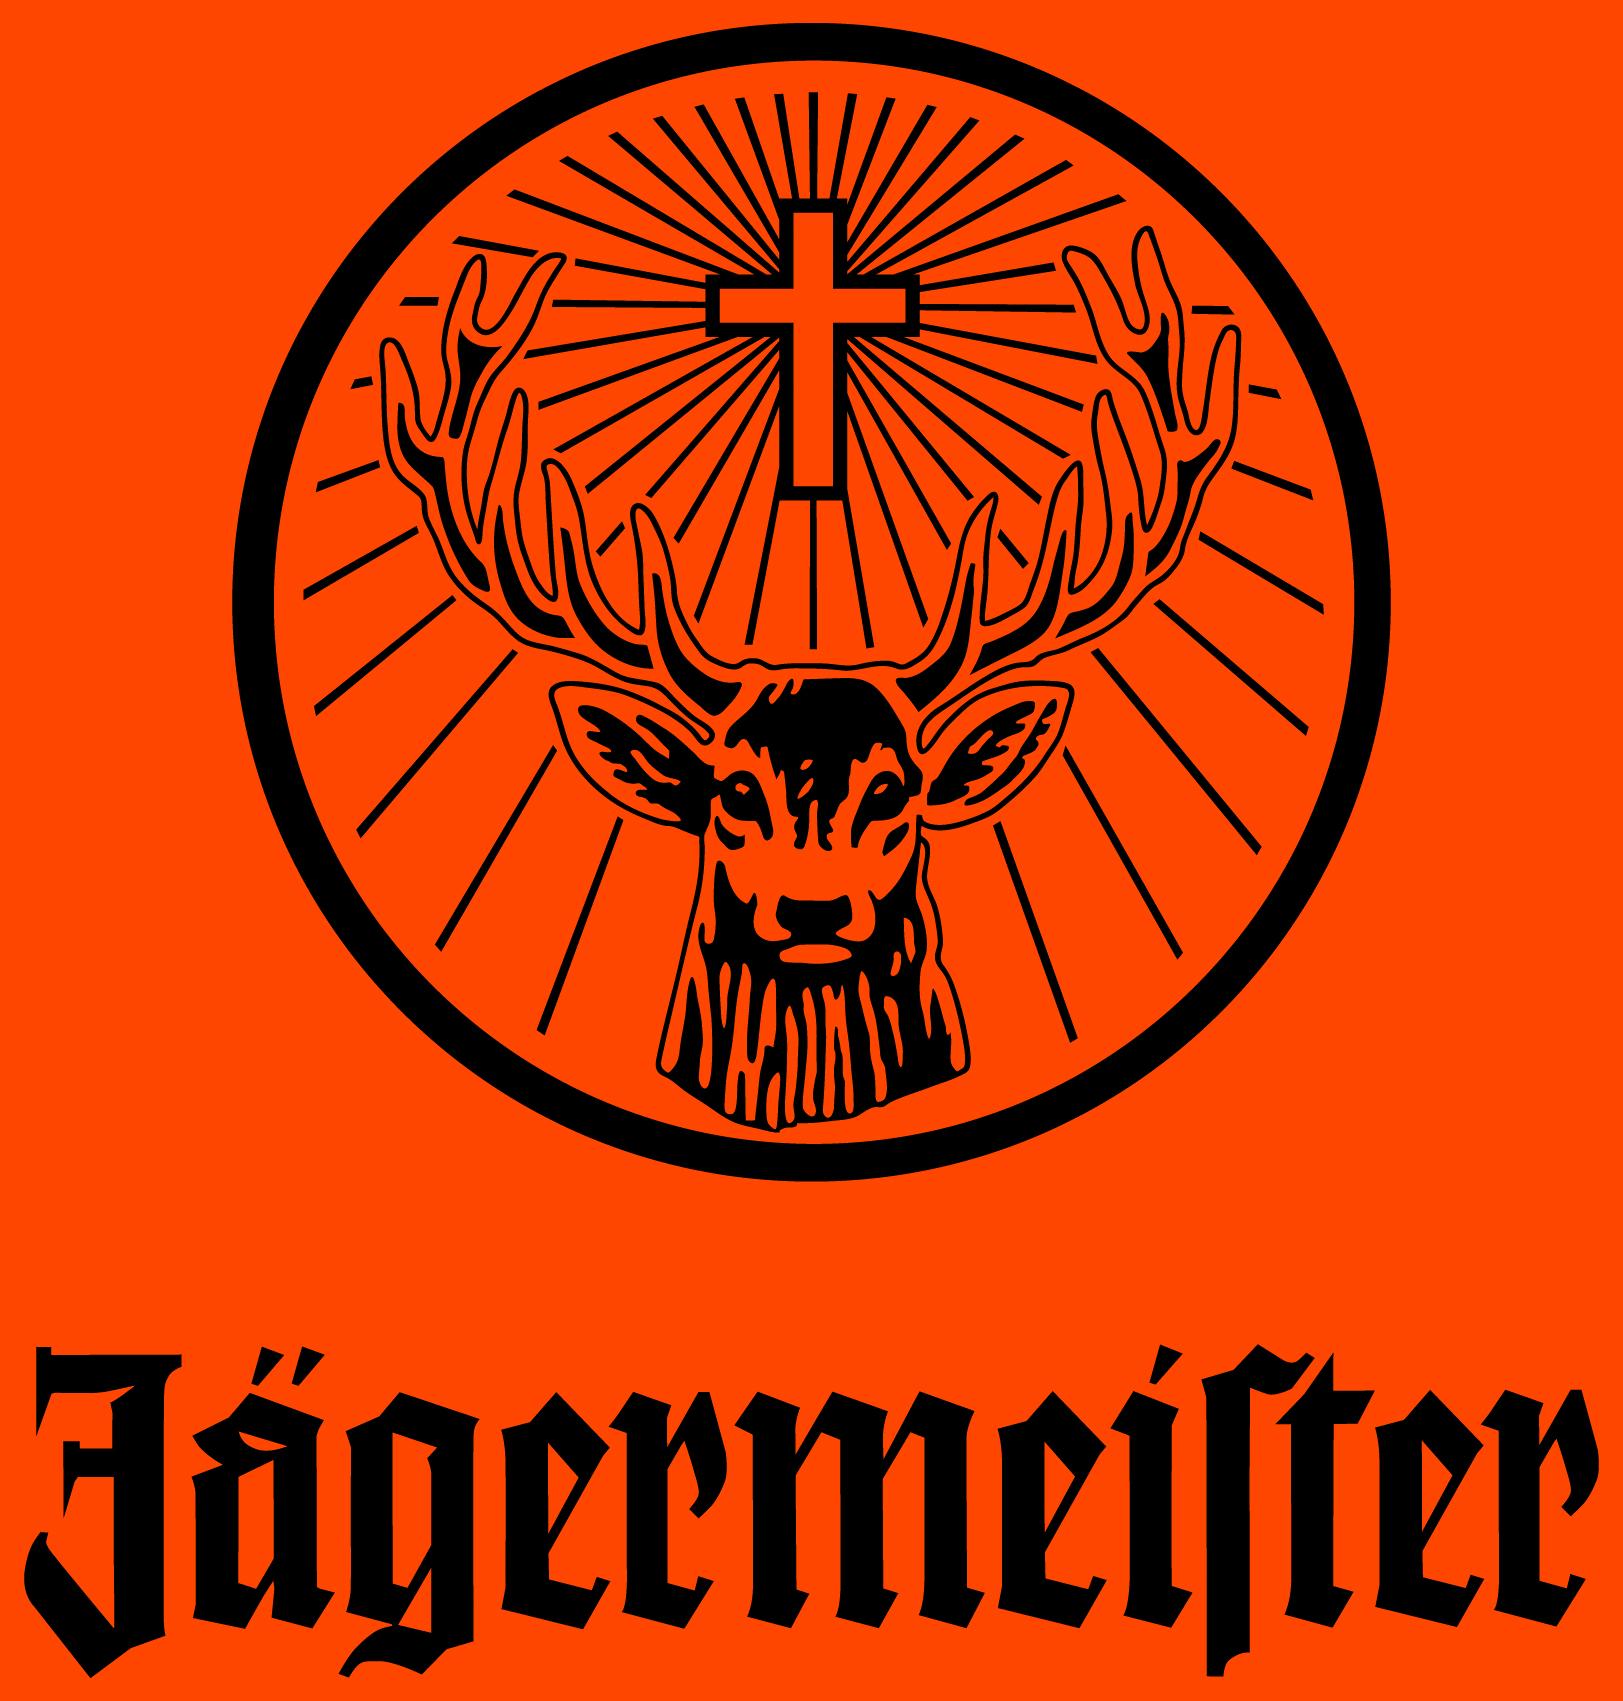 Amazing Jägermeister Pictures & Backgrounds